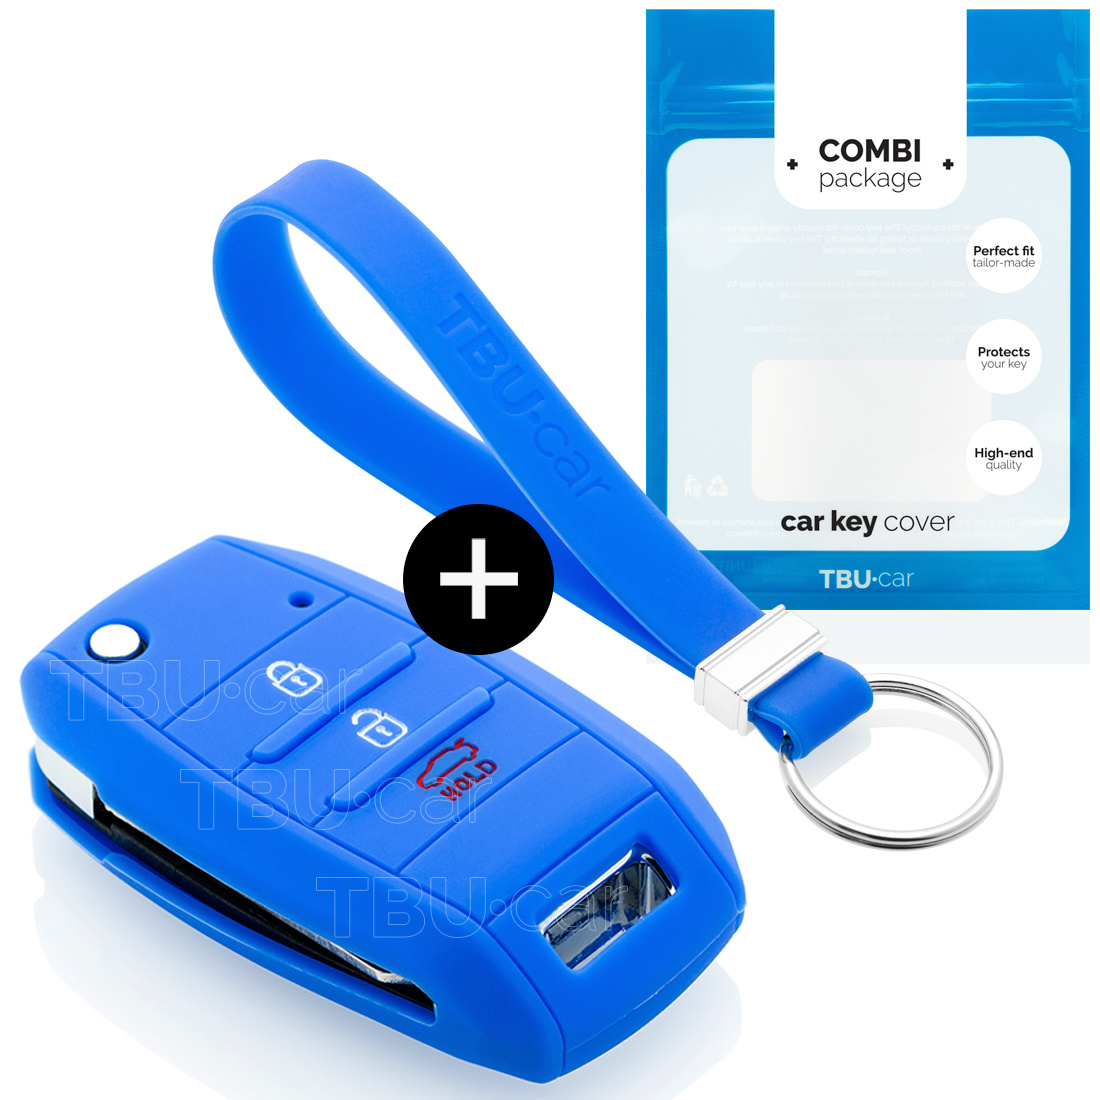 Kia Autoschlüssel Hülle - Silikon Schutzhülle - Schlüsselhülle Cover - Blau